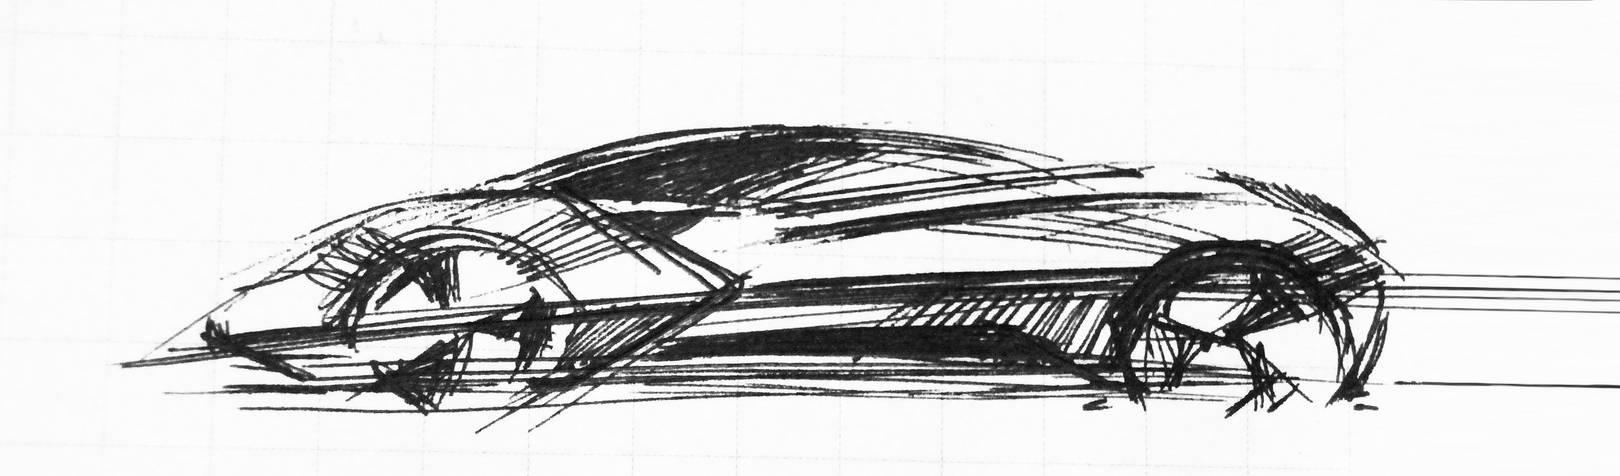 Quick sketch#2